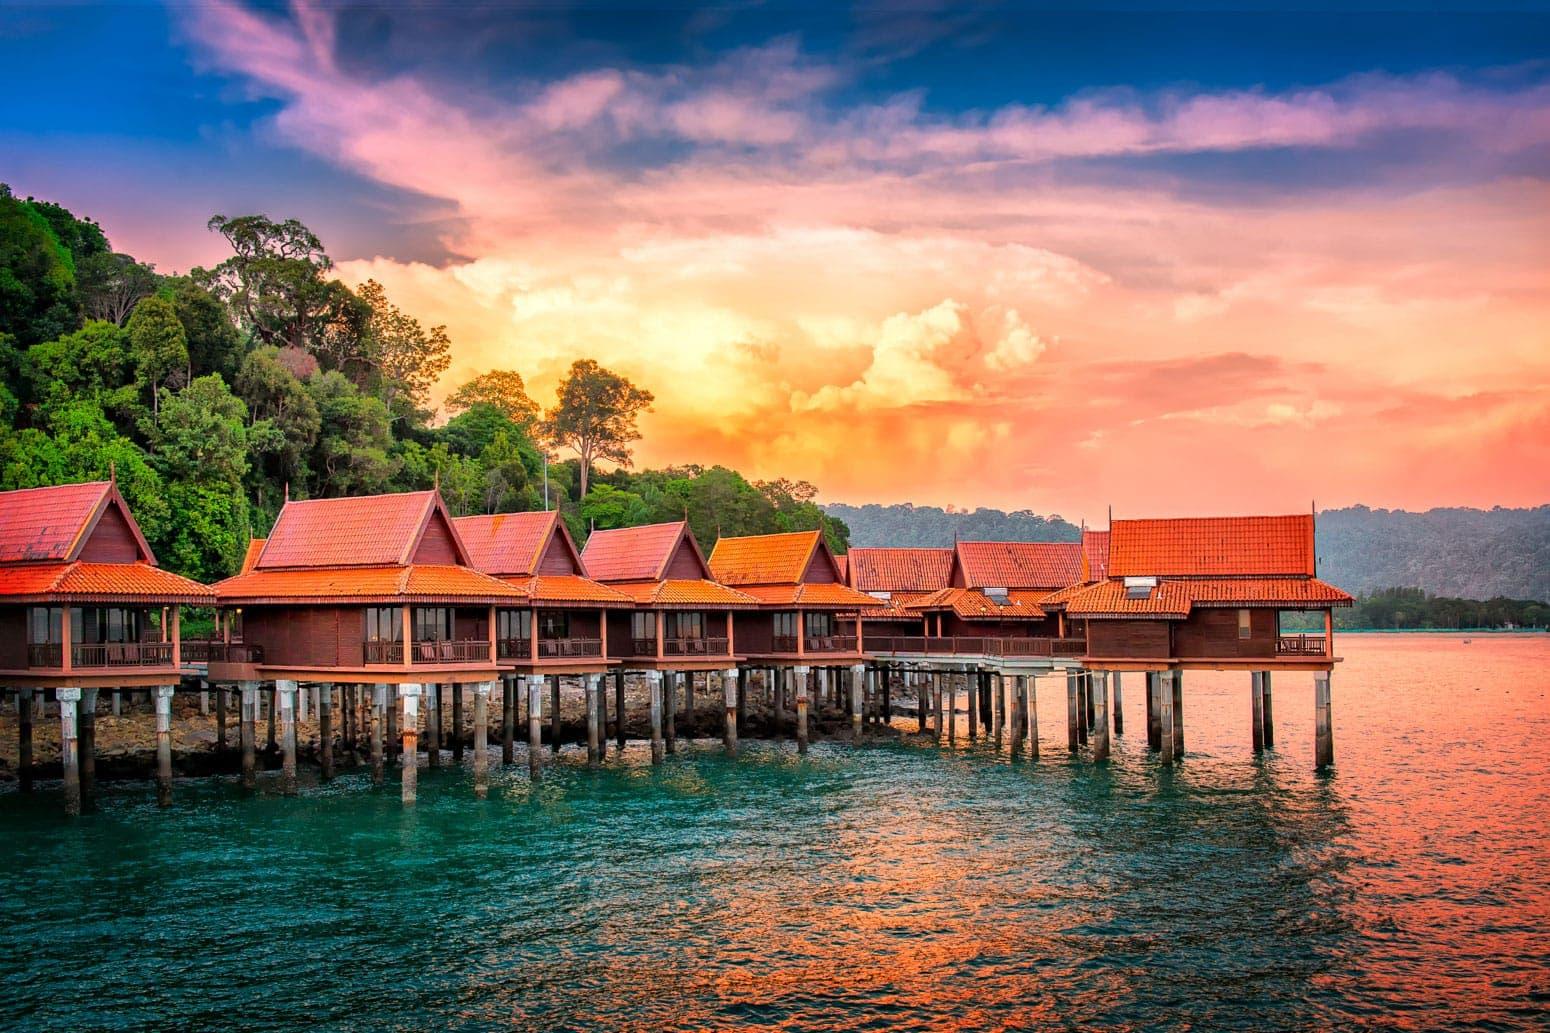 Wasserbungalows | Insel Langkawi, Malaysia